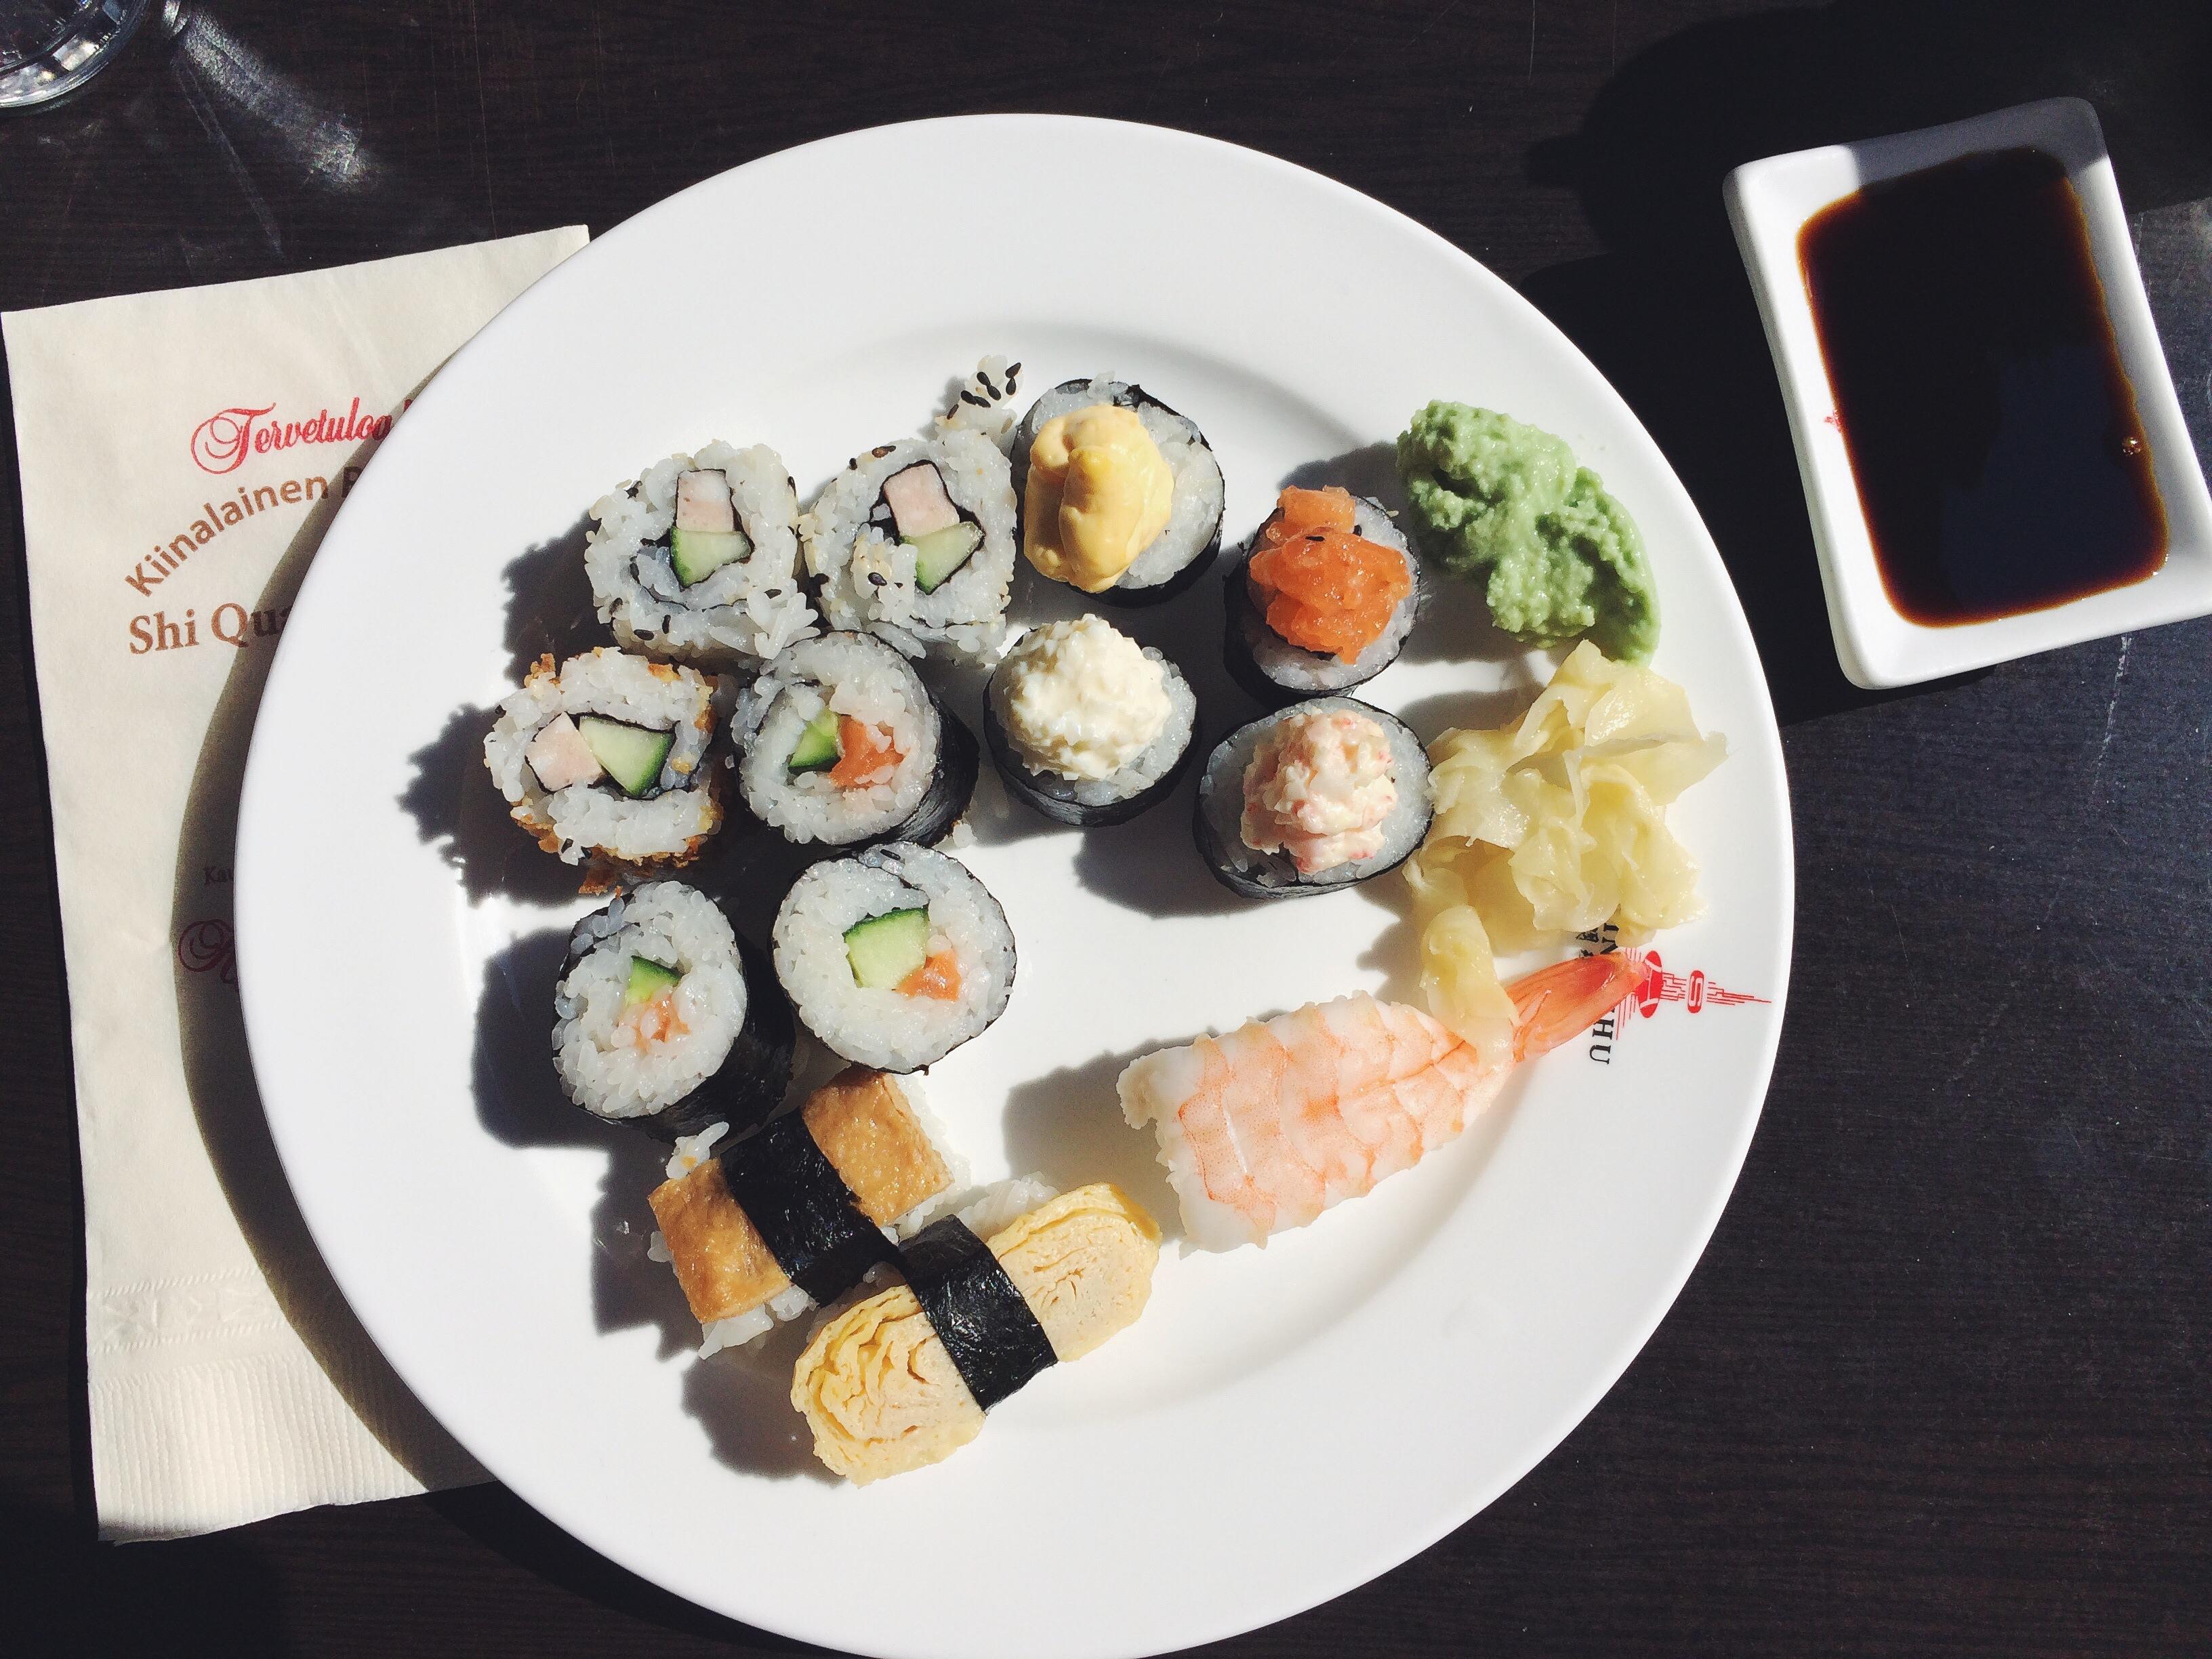 Kiinalainen ravintola Shi Quan Shi Mei, Seinäjoki: Noutopöydän sushit